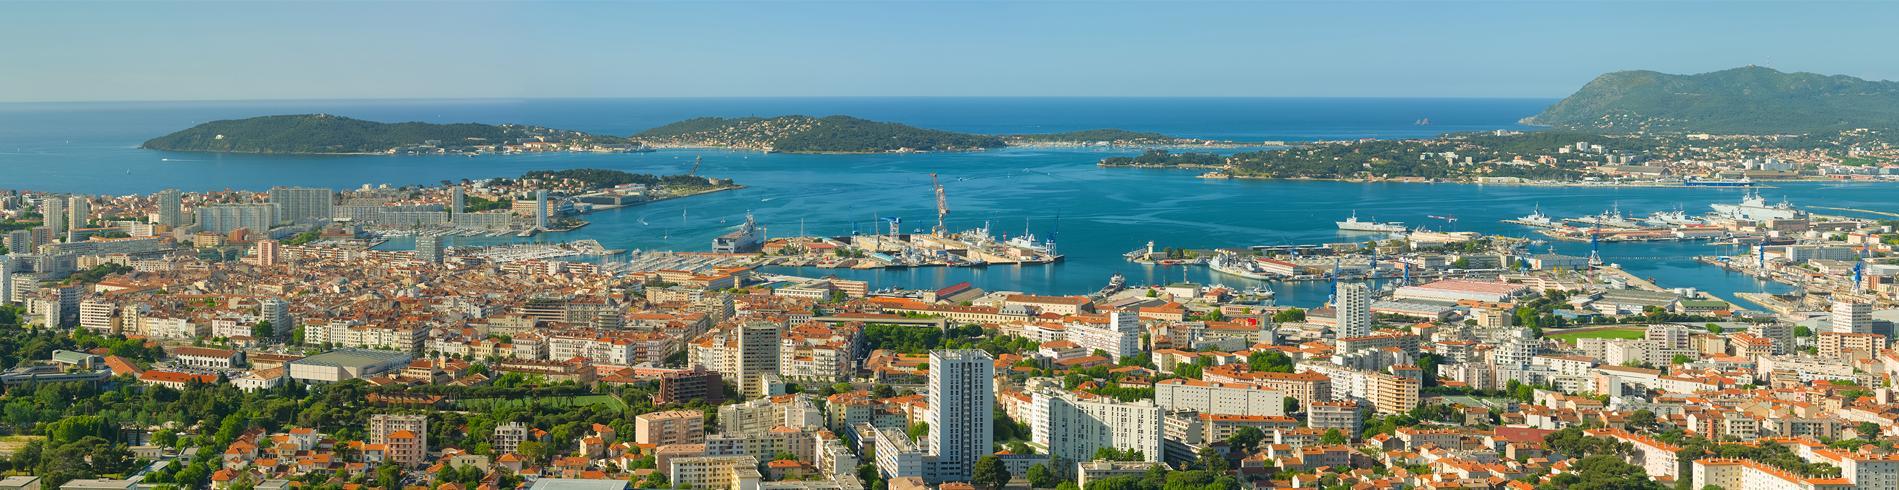 Panorama of Toulon